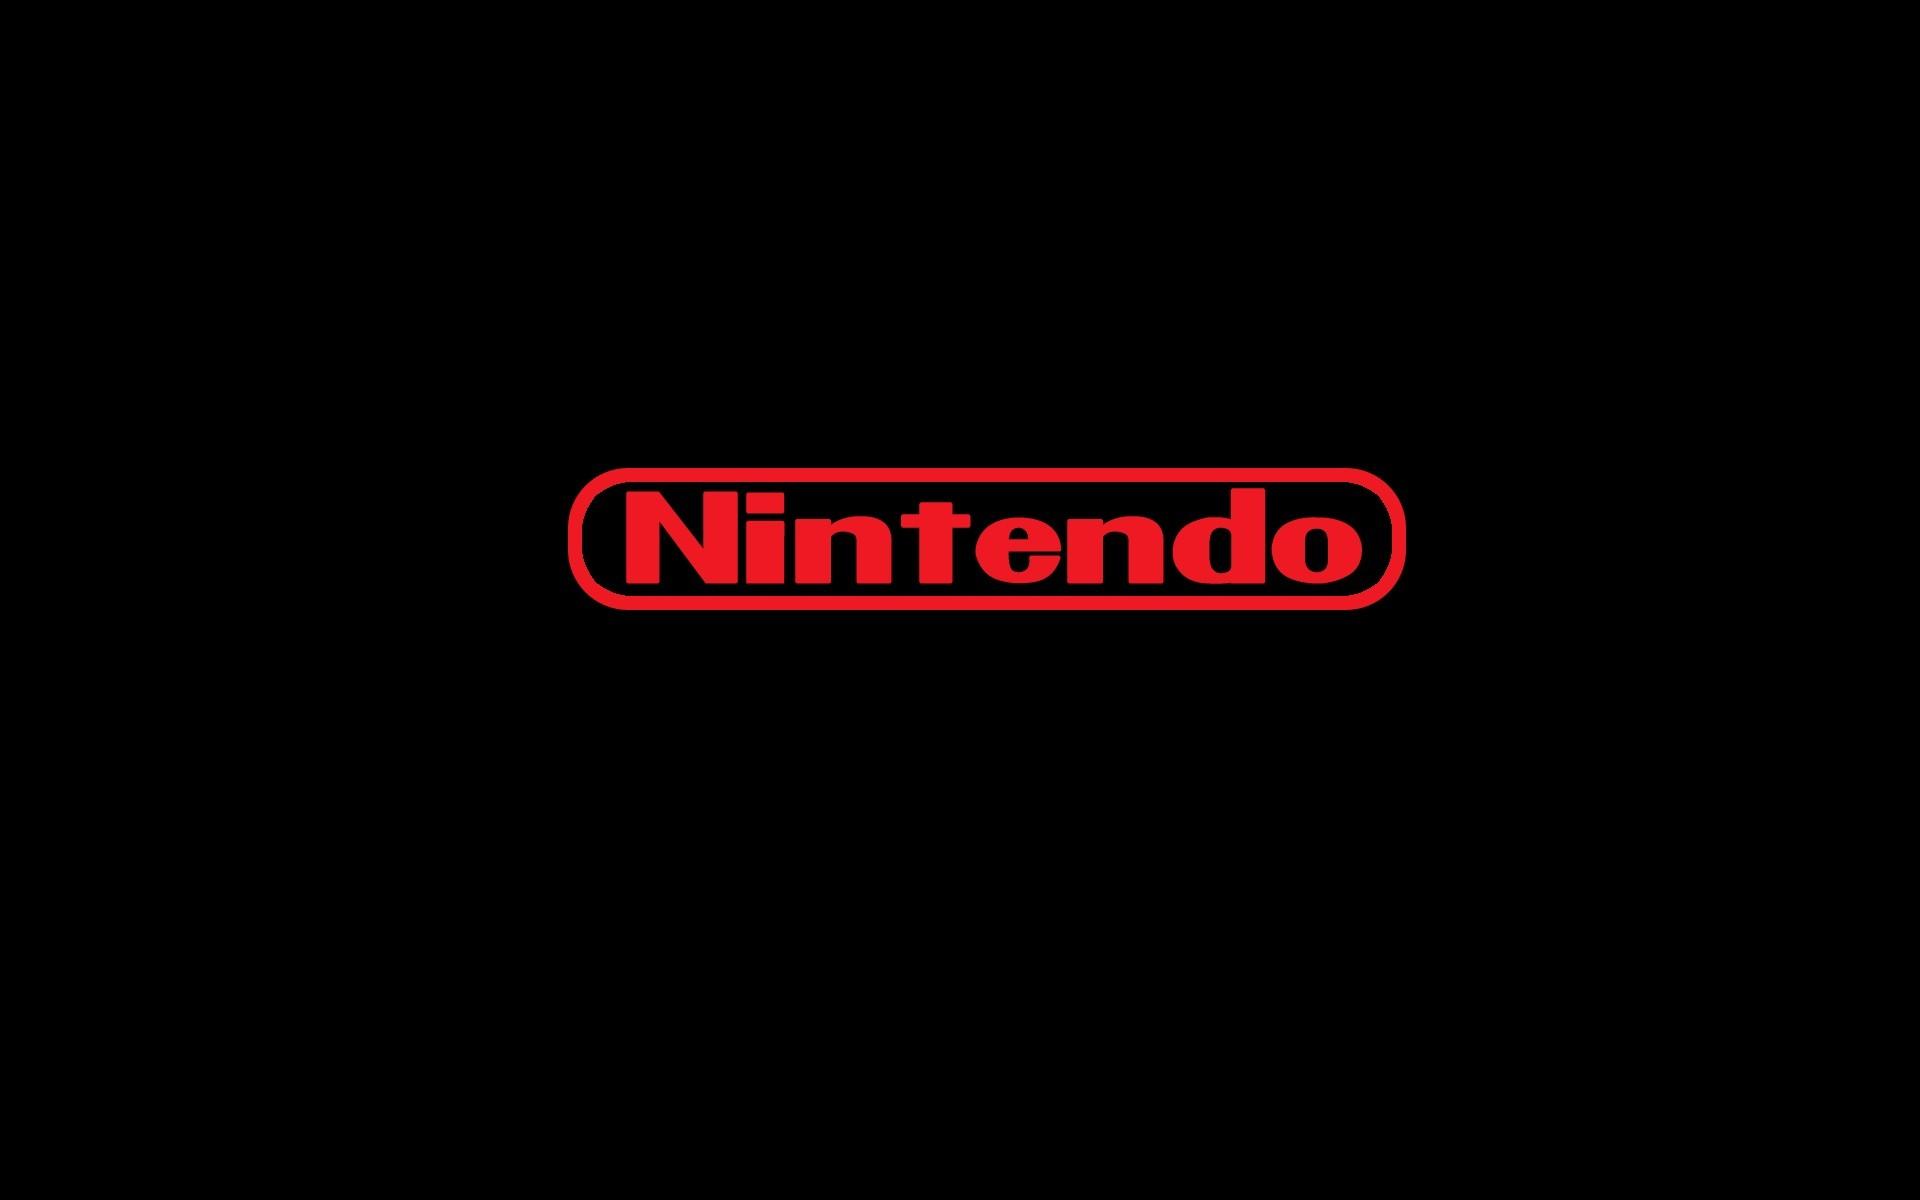 Full HD p Nintendo Wallpapers HD, Desktop Backgrounds 1920×1200 Nintendo  Backgrounds (40 Wallpapers) | Adorable Wallpapers | Wallpapers | Pinterest  | Full …